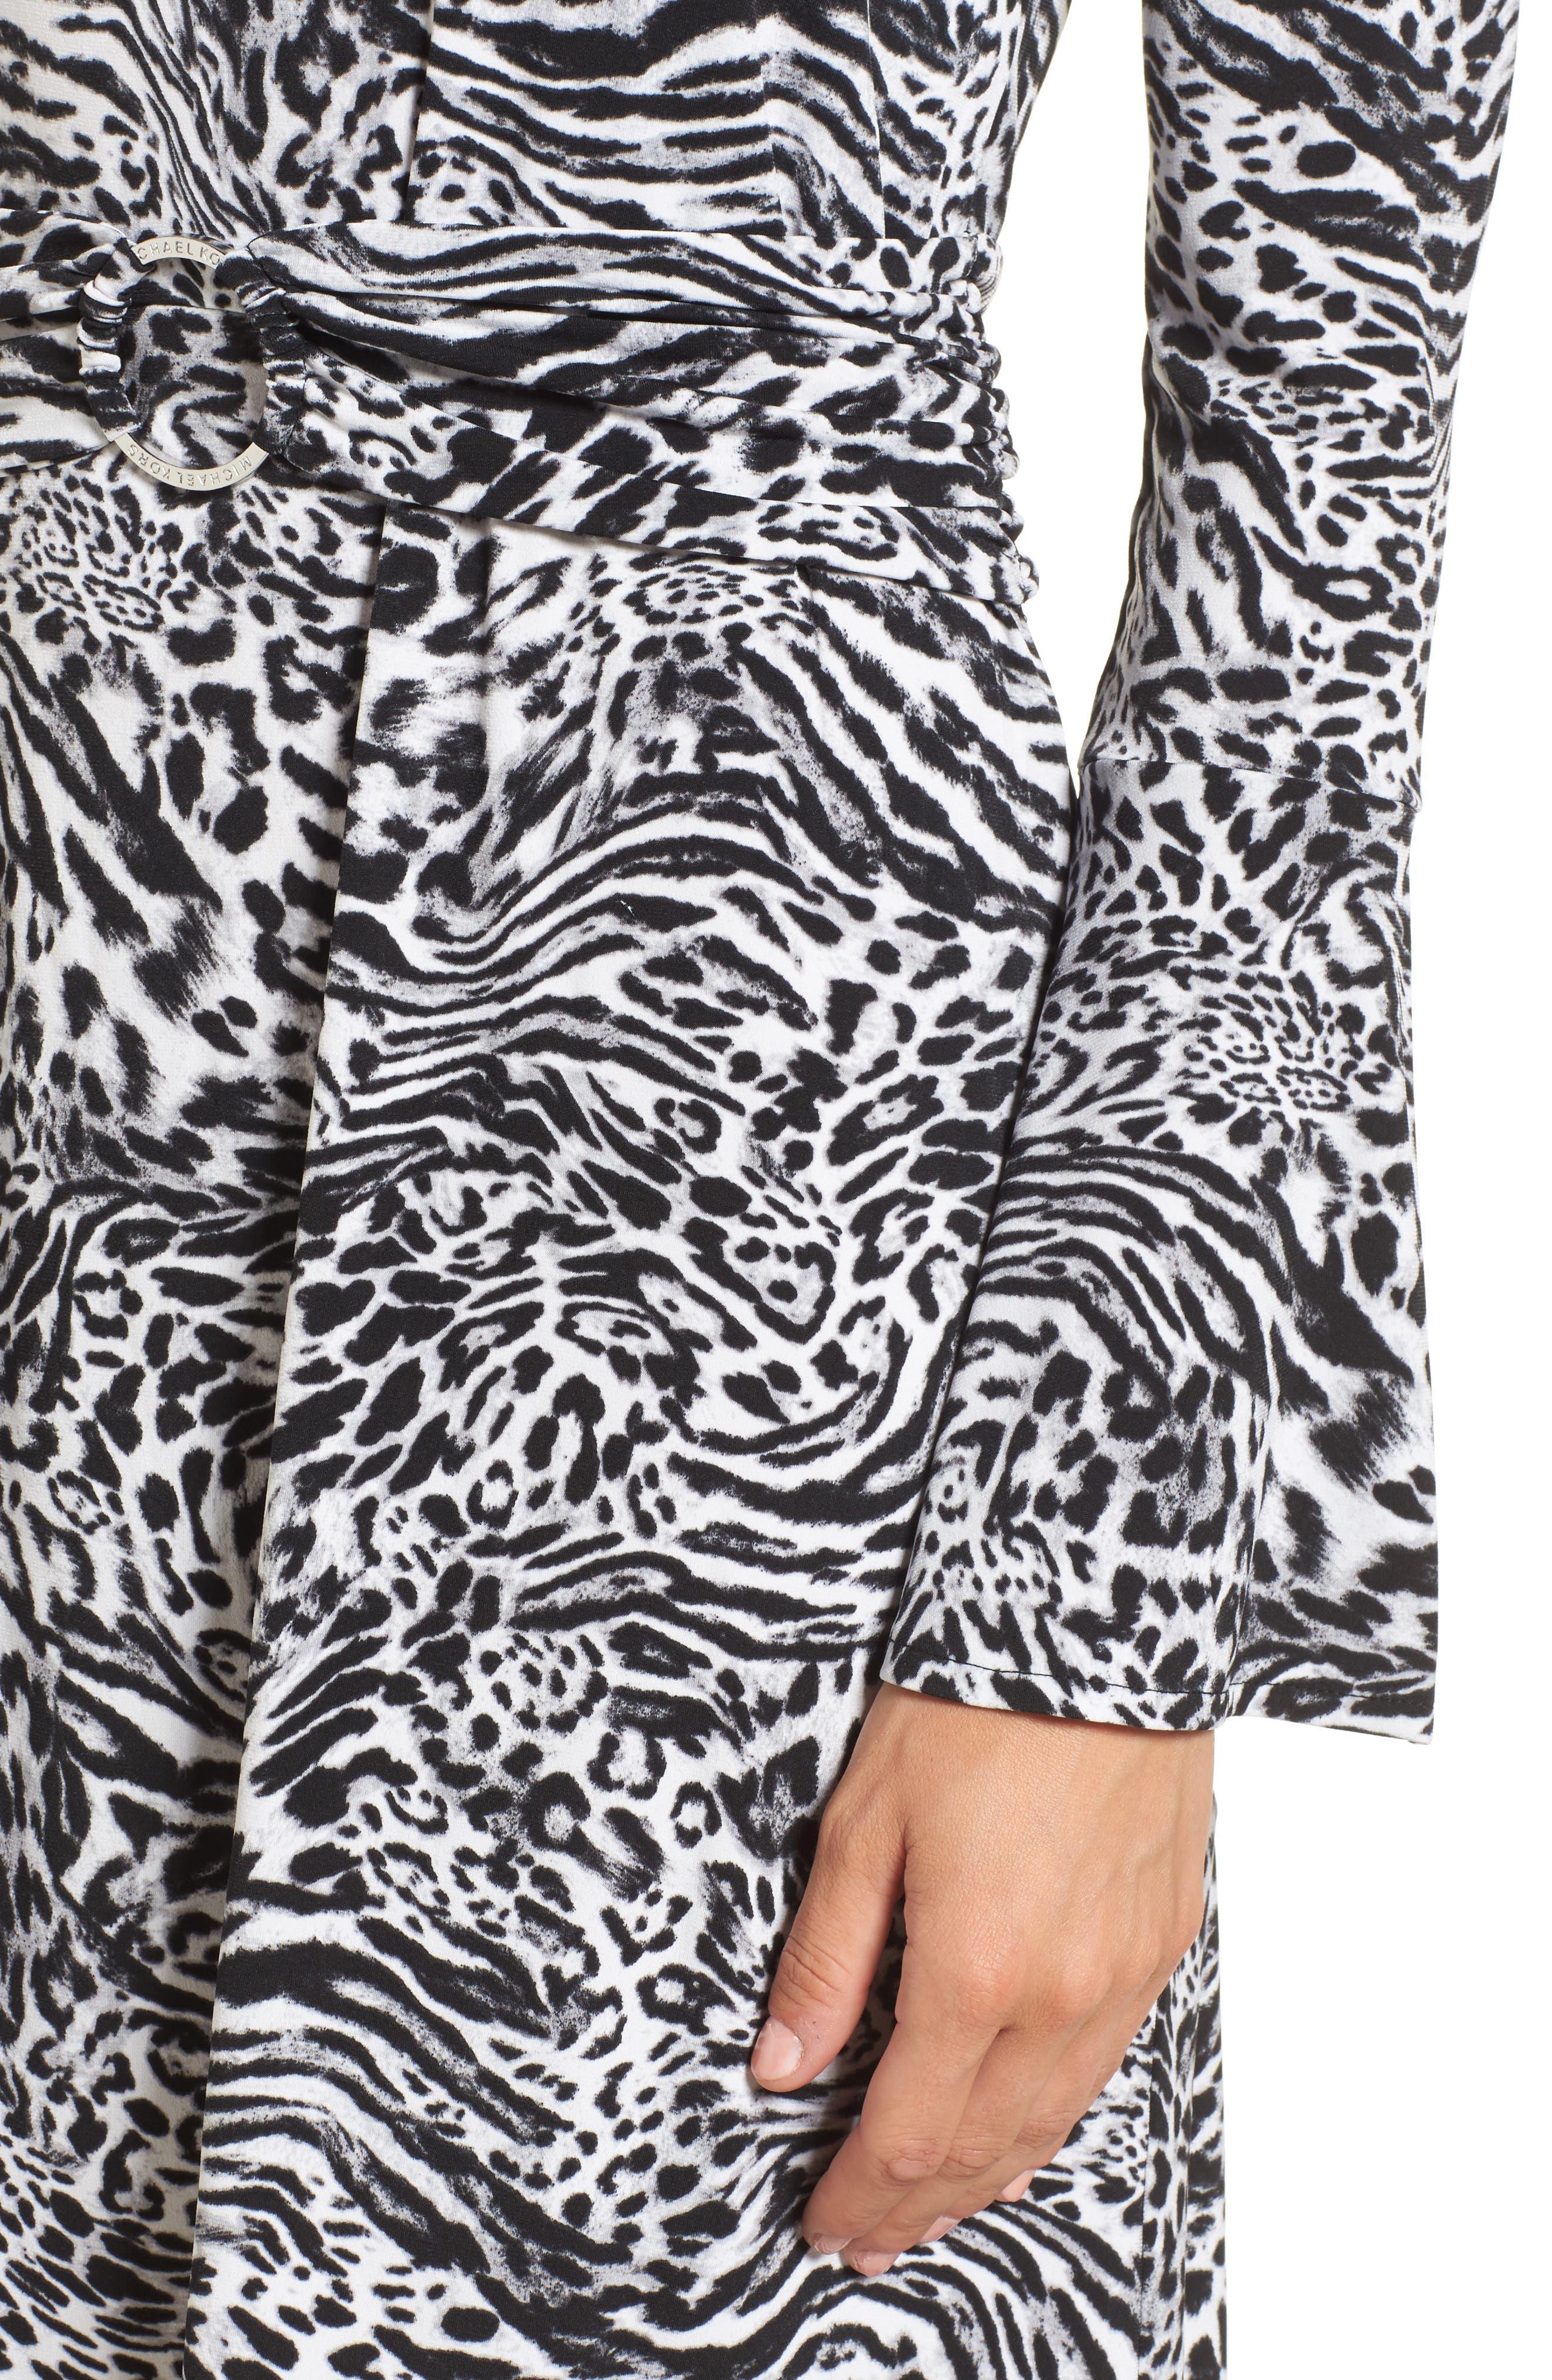 Big Cat A-Line Dress,                             Alternate thumbnail 4, color,                             001